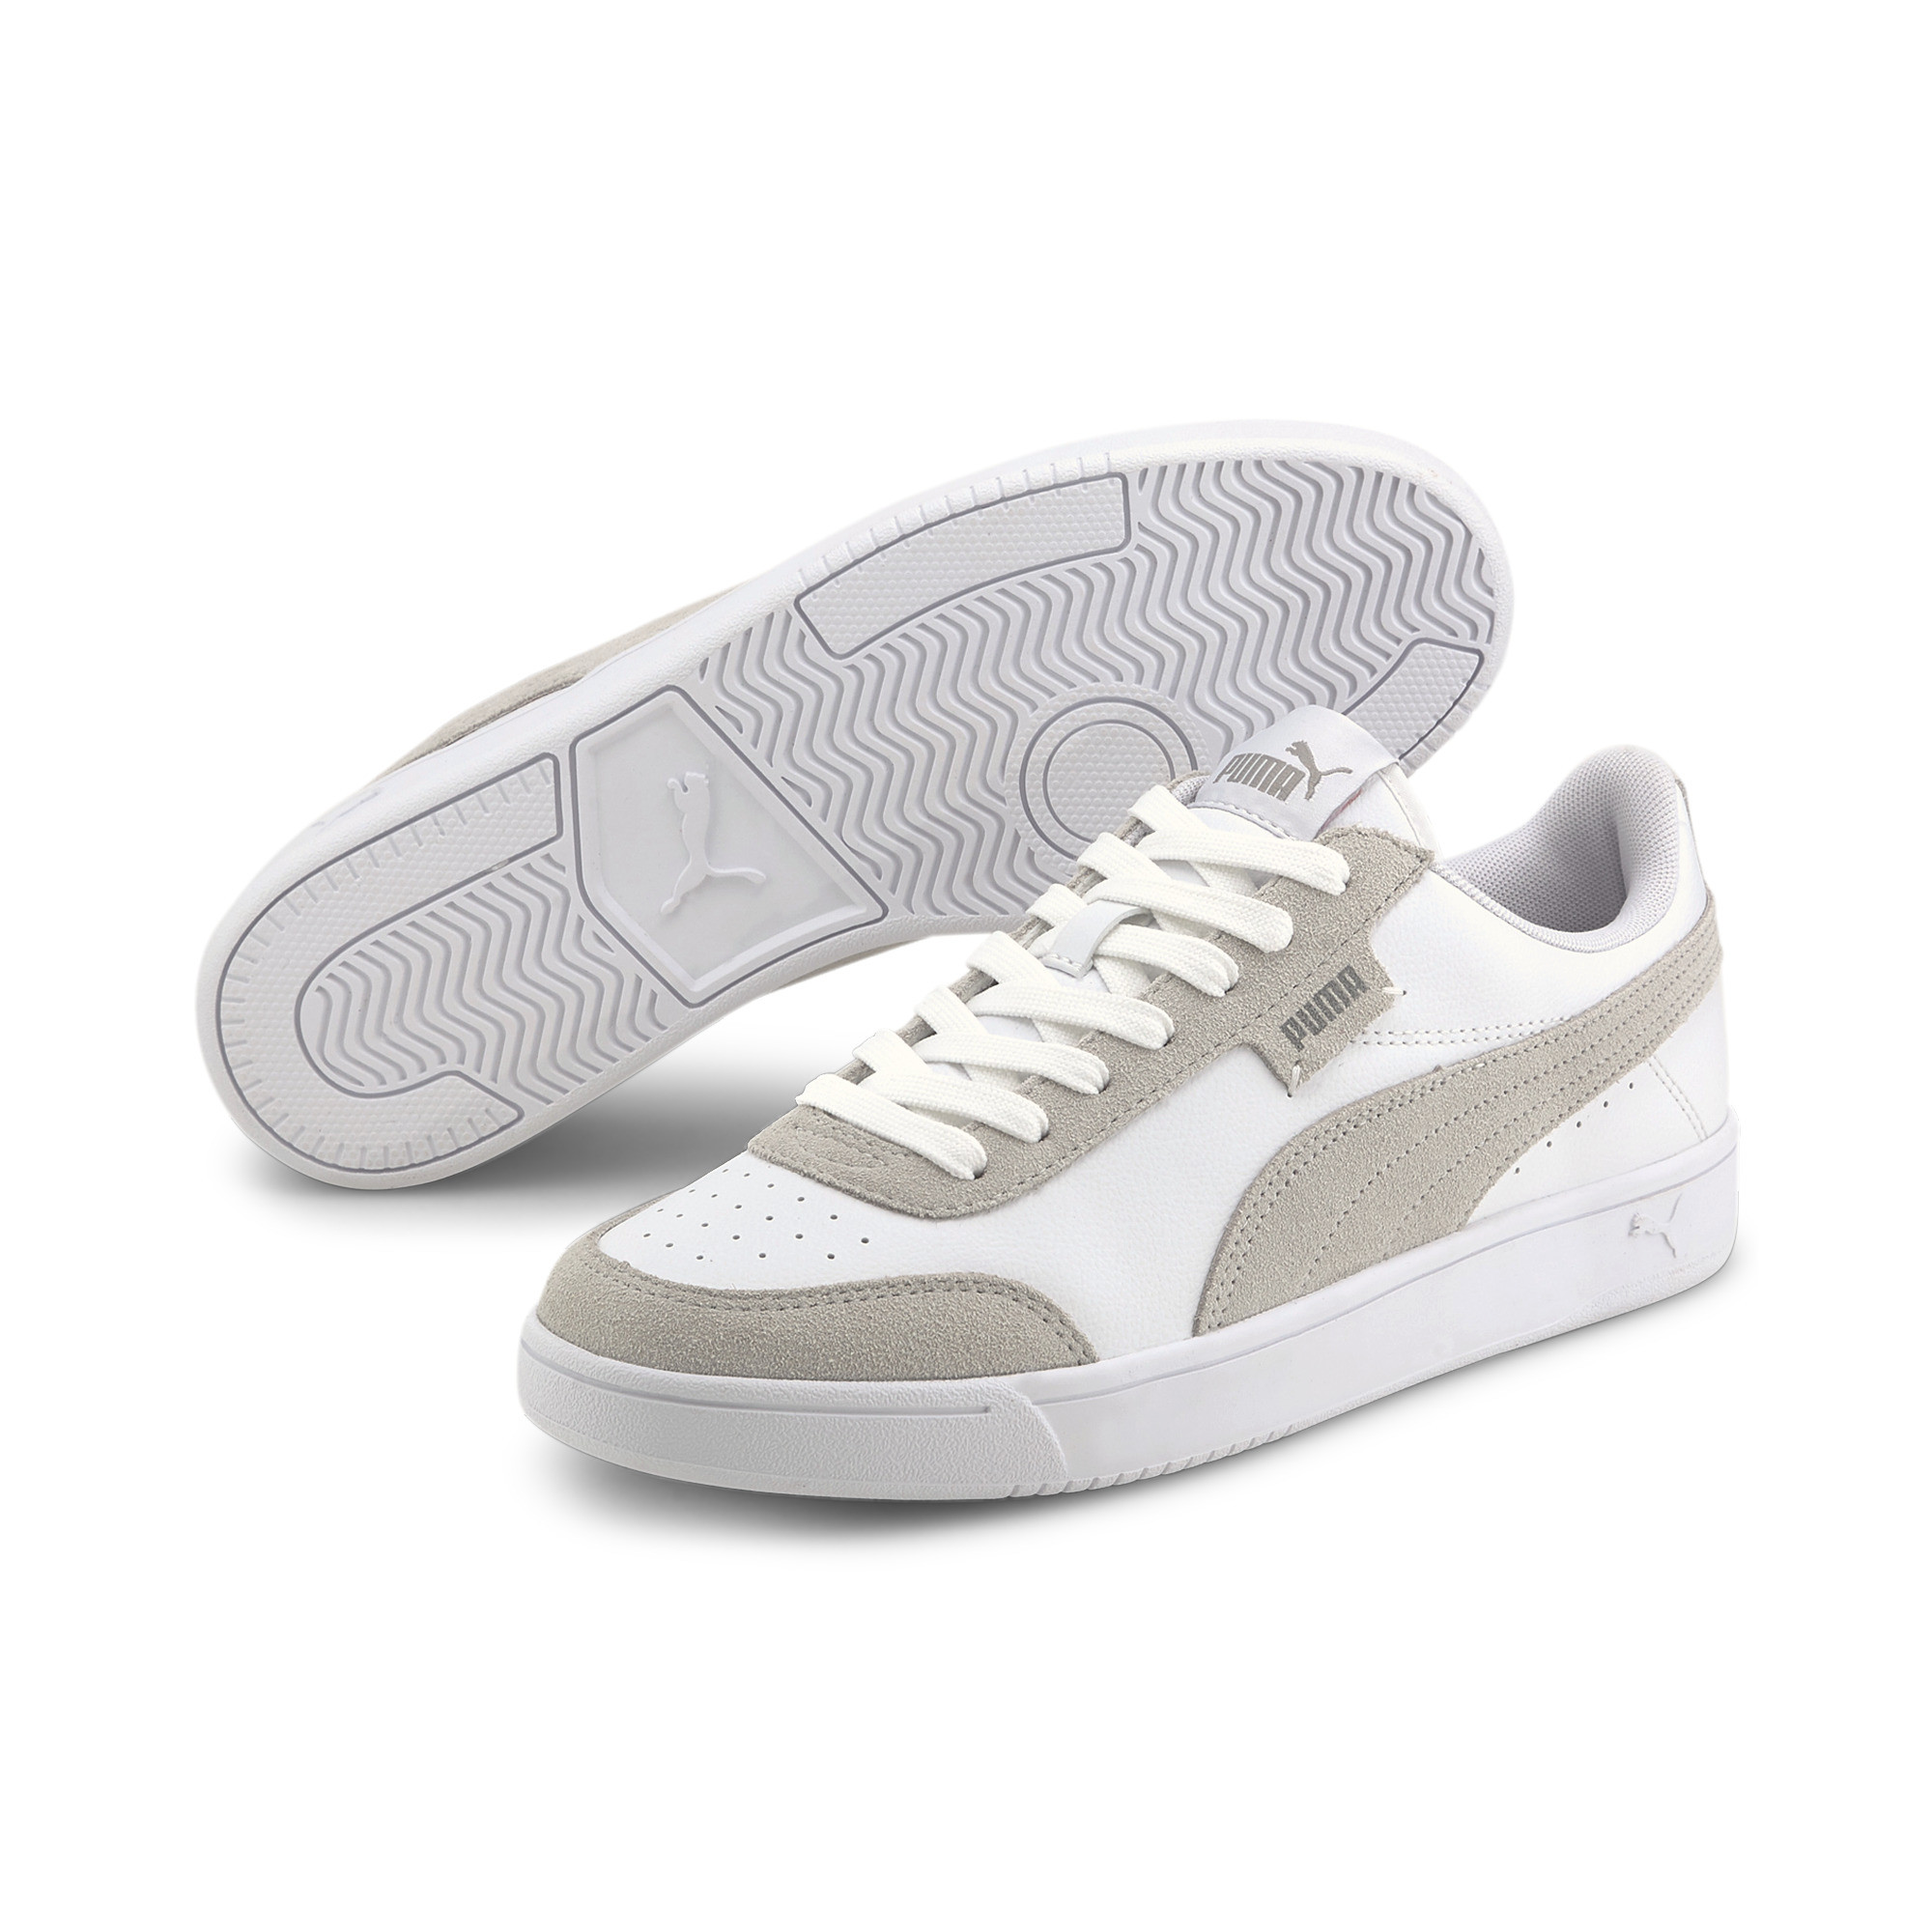 Indexbild 8 - PUMA Court Legend Lo Sneaker Unisex Schuhe Basics Neu